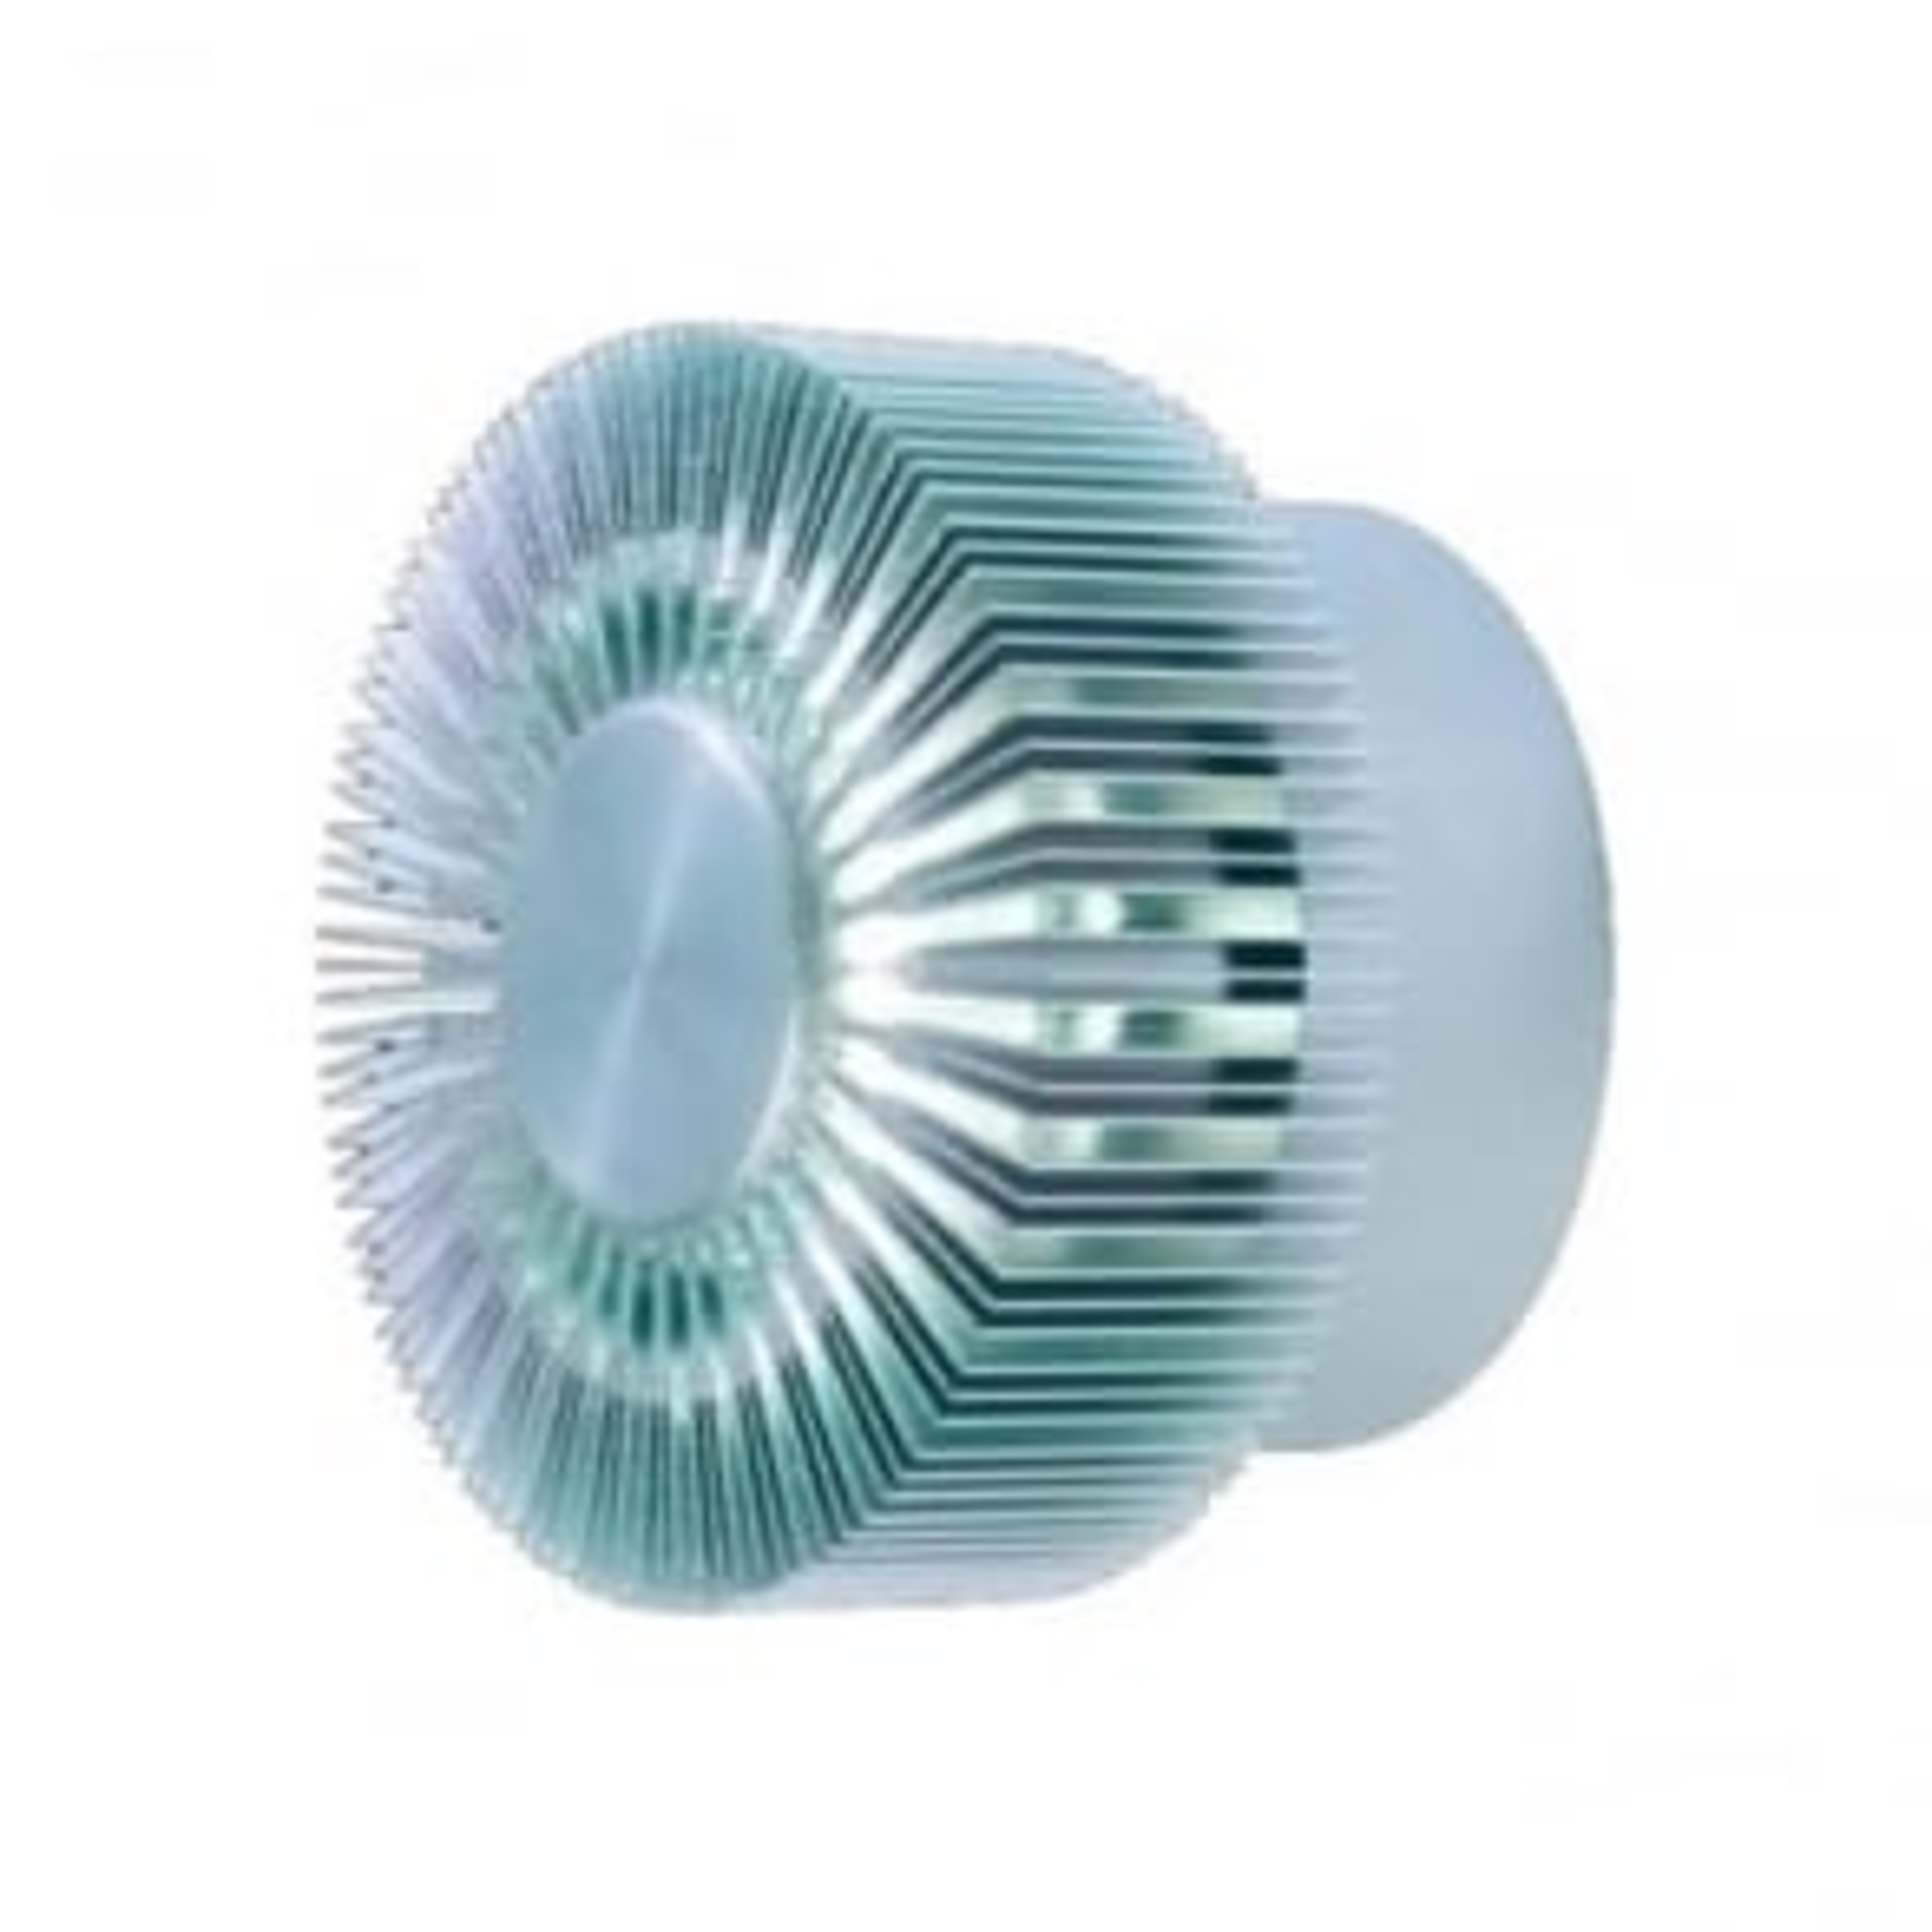 WL041 IP MAINS fan effect LED wall light - Anodised Aluminium